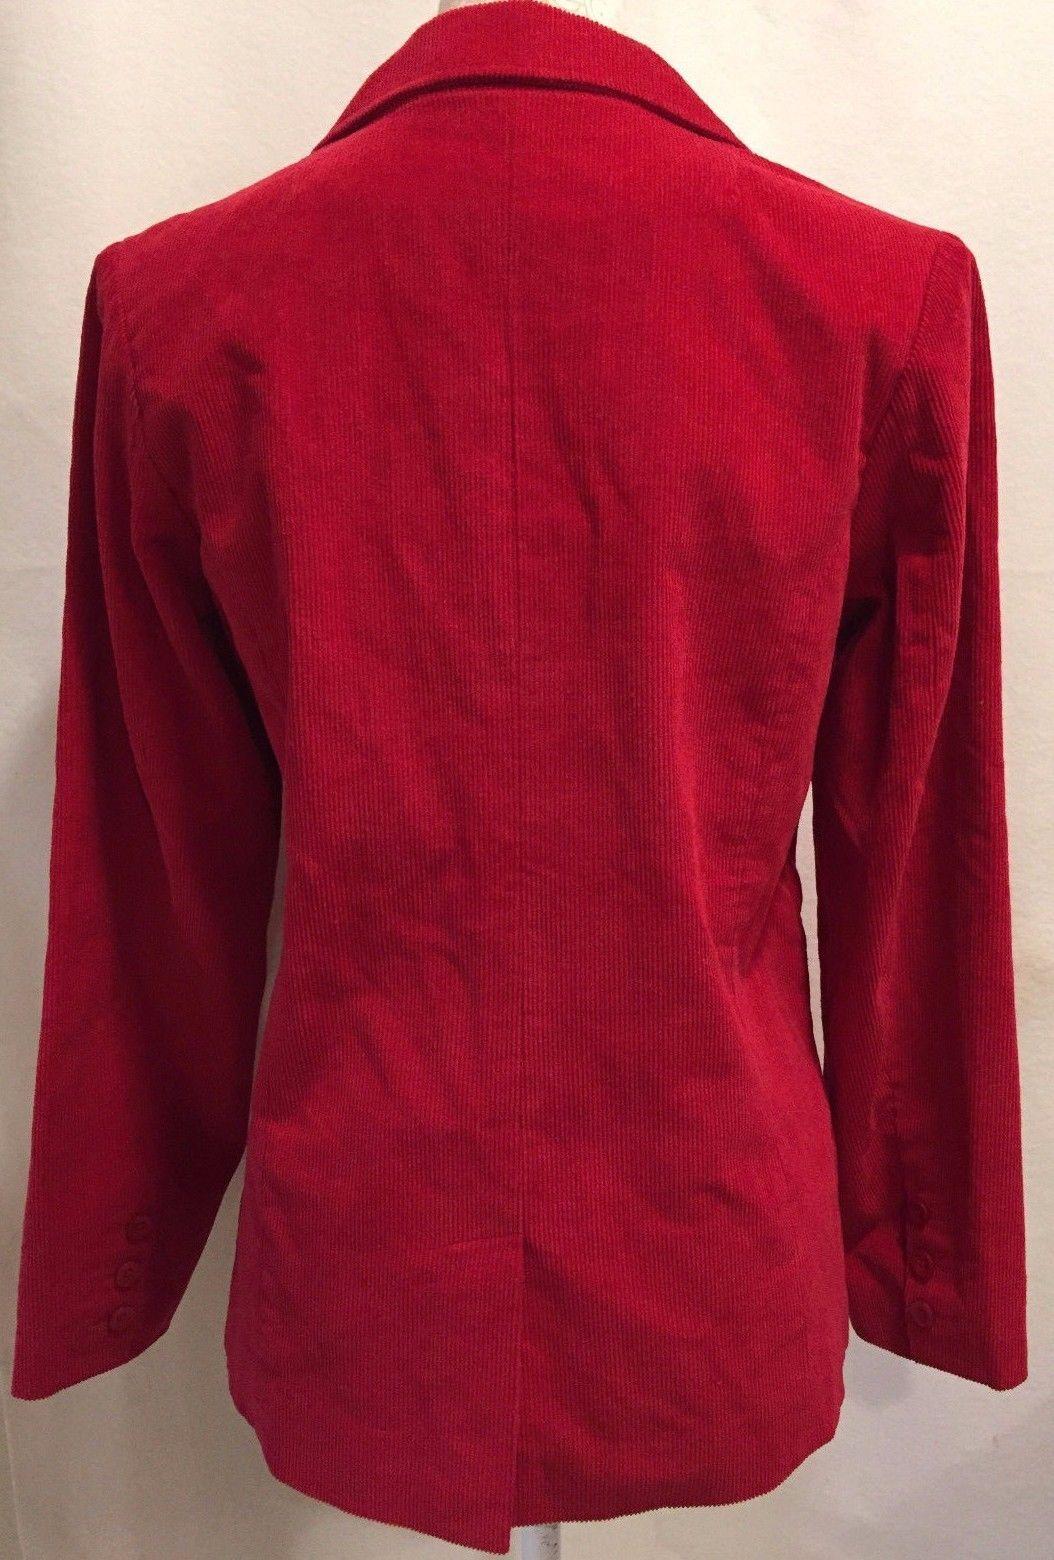 DENIM & CO WOMEN RED CORDUROY LONG SLEEVE JACKET COAT SIZE XS X-SMALL